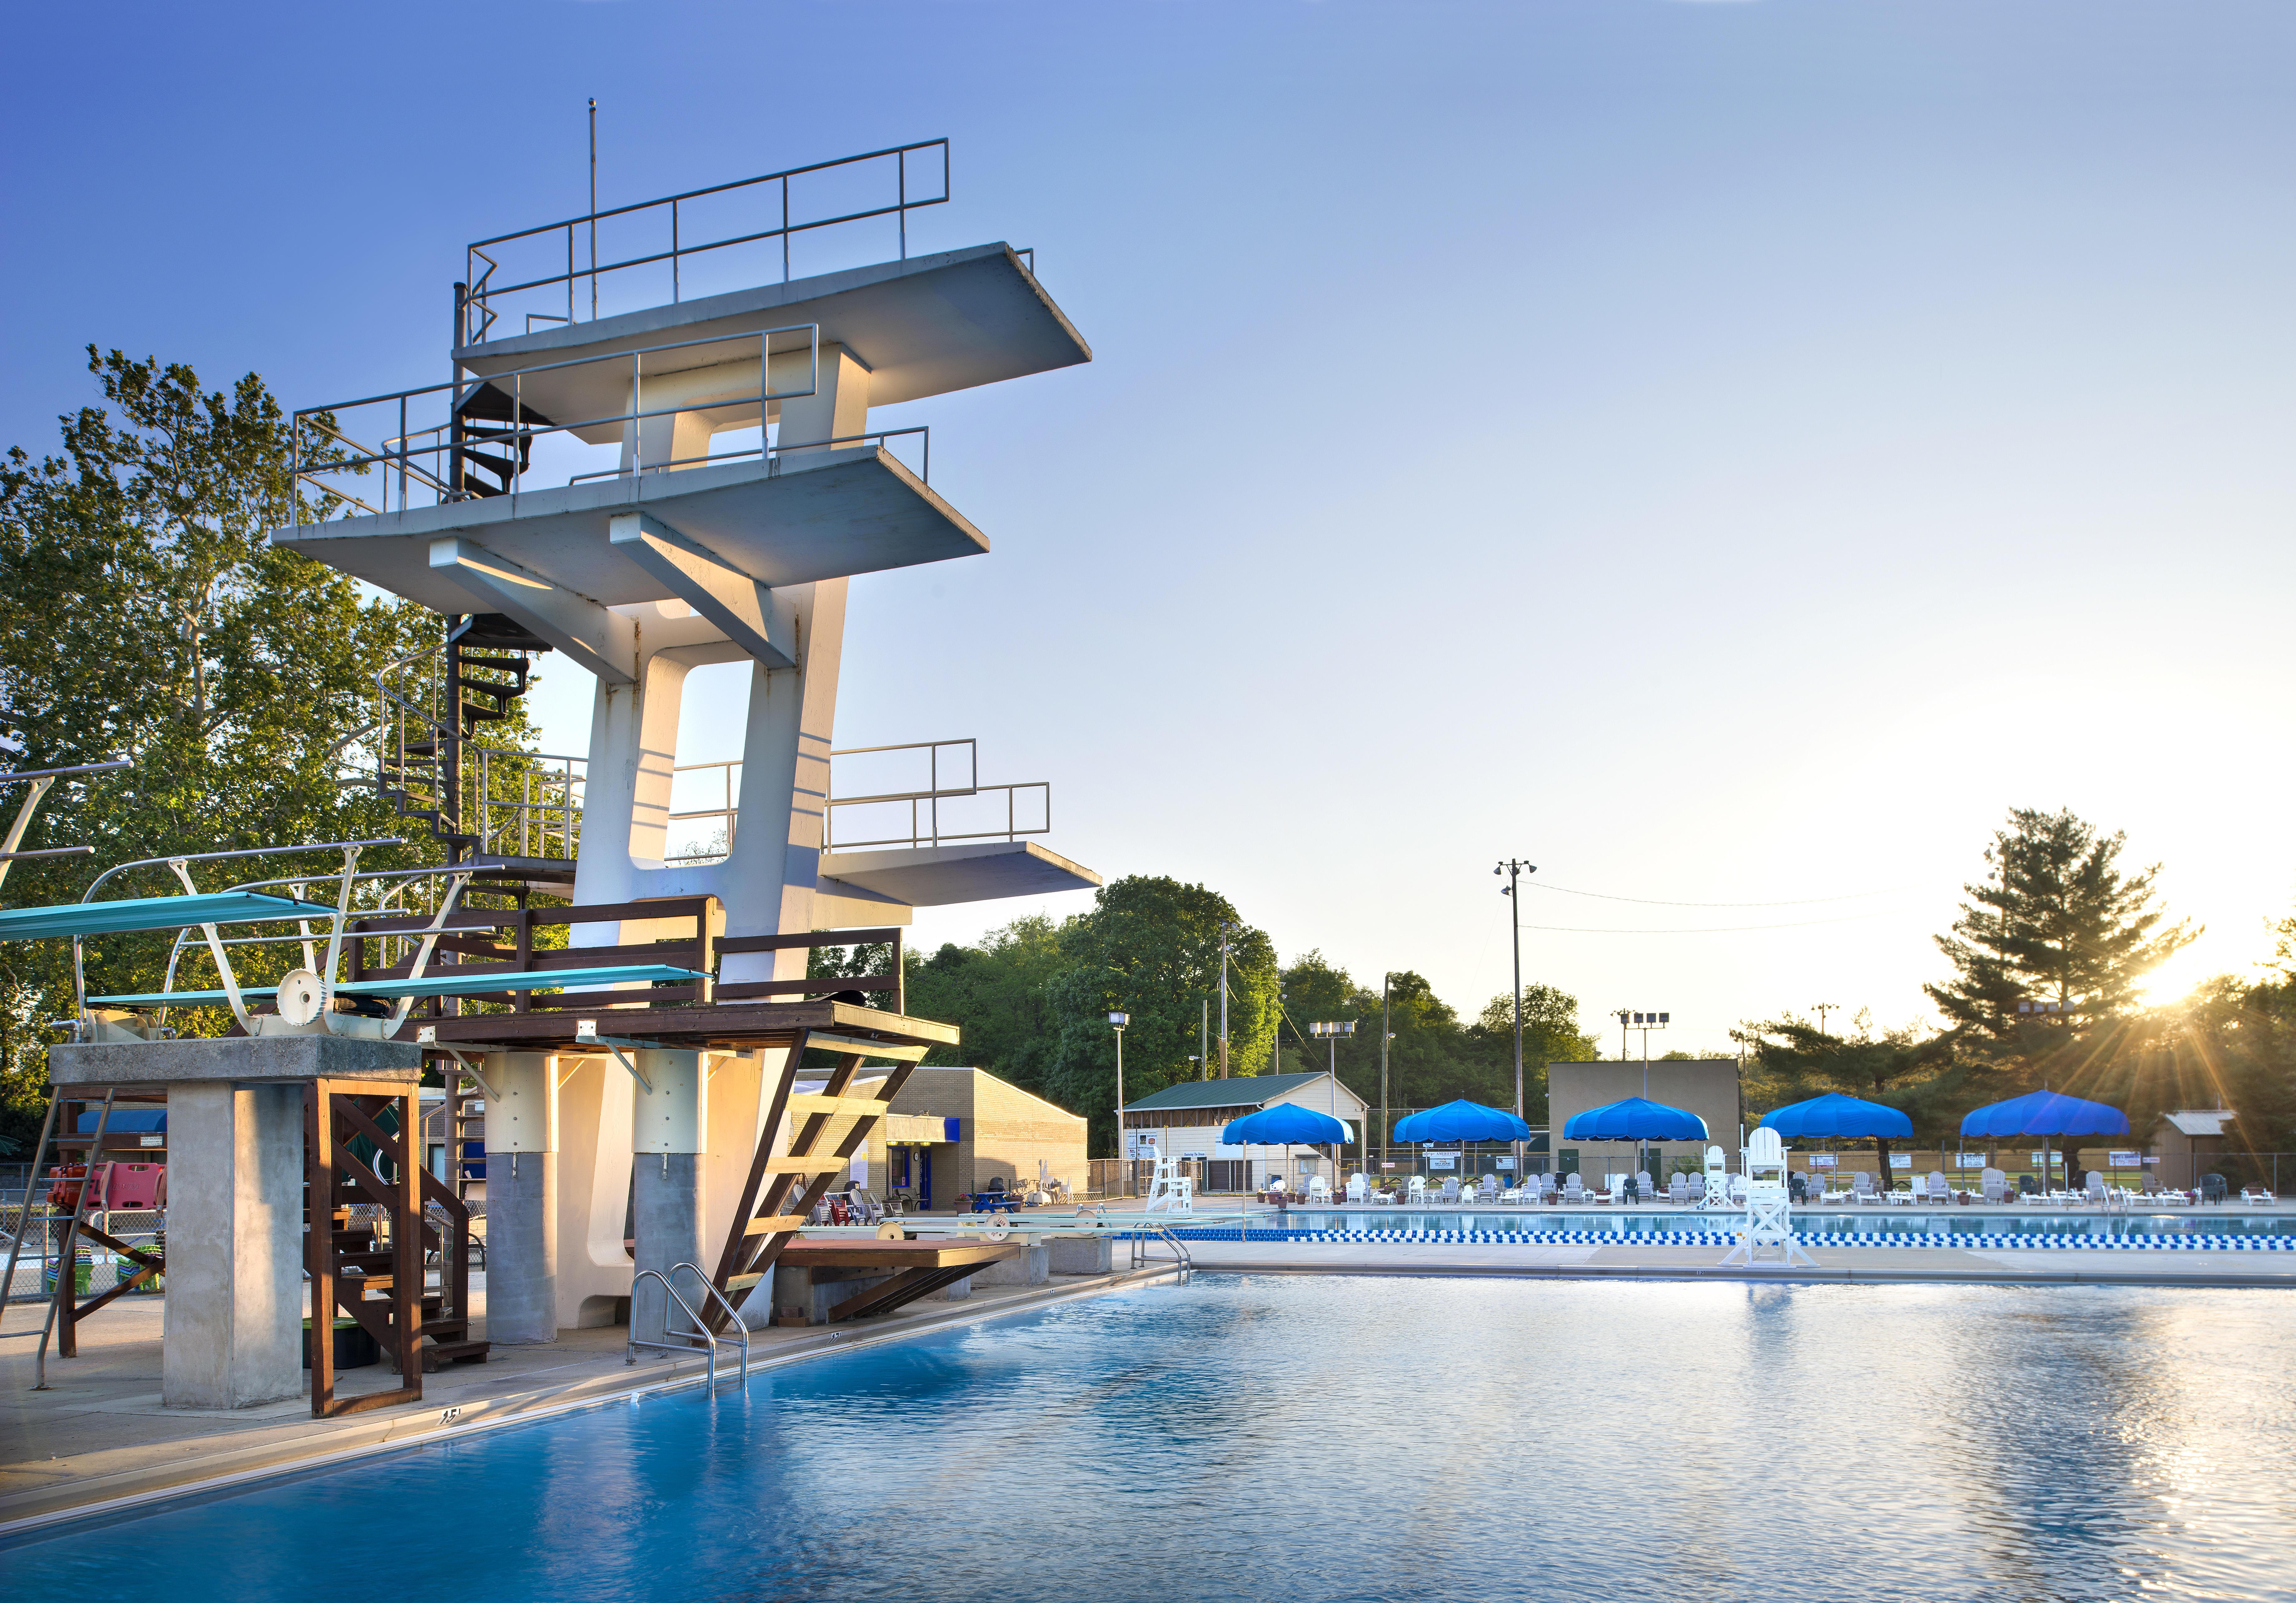 sports facilities events services hamilton county na forest park aquatic center